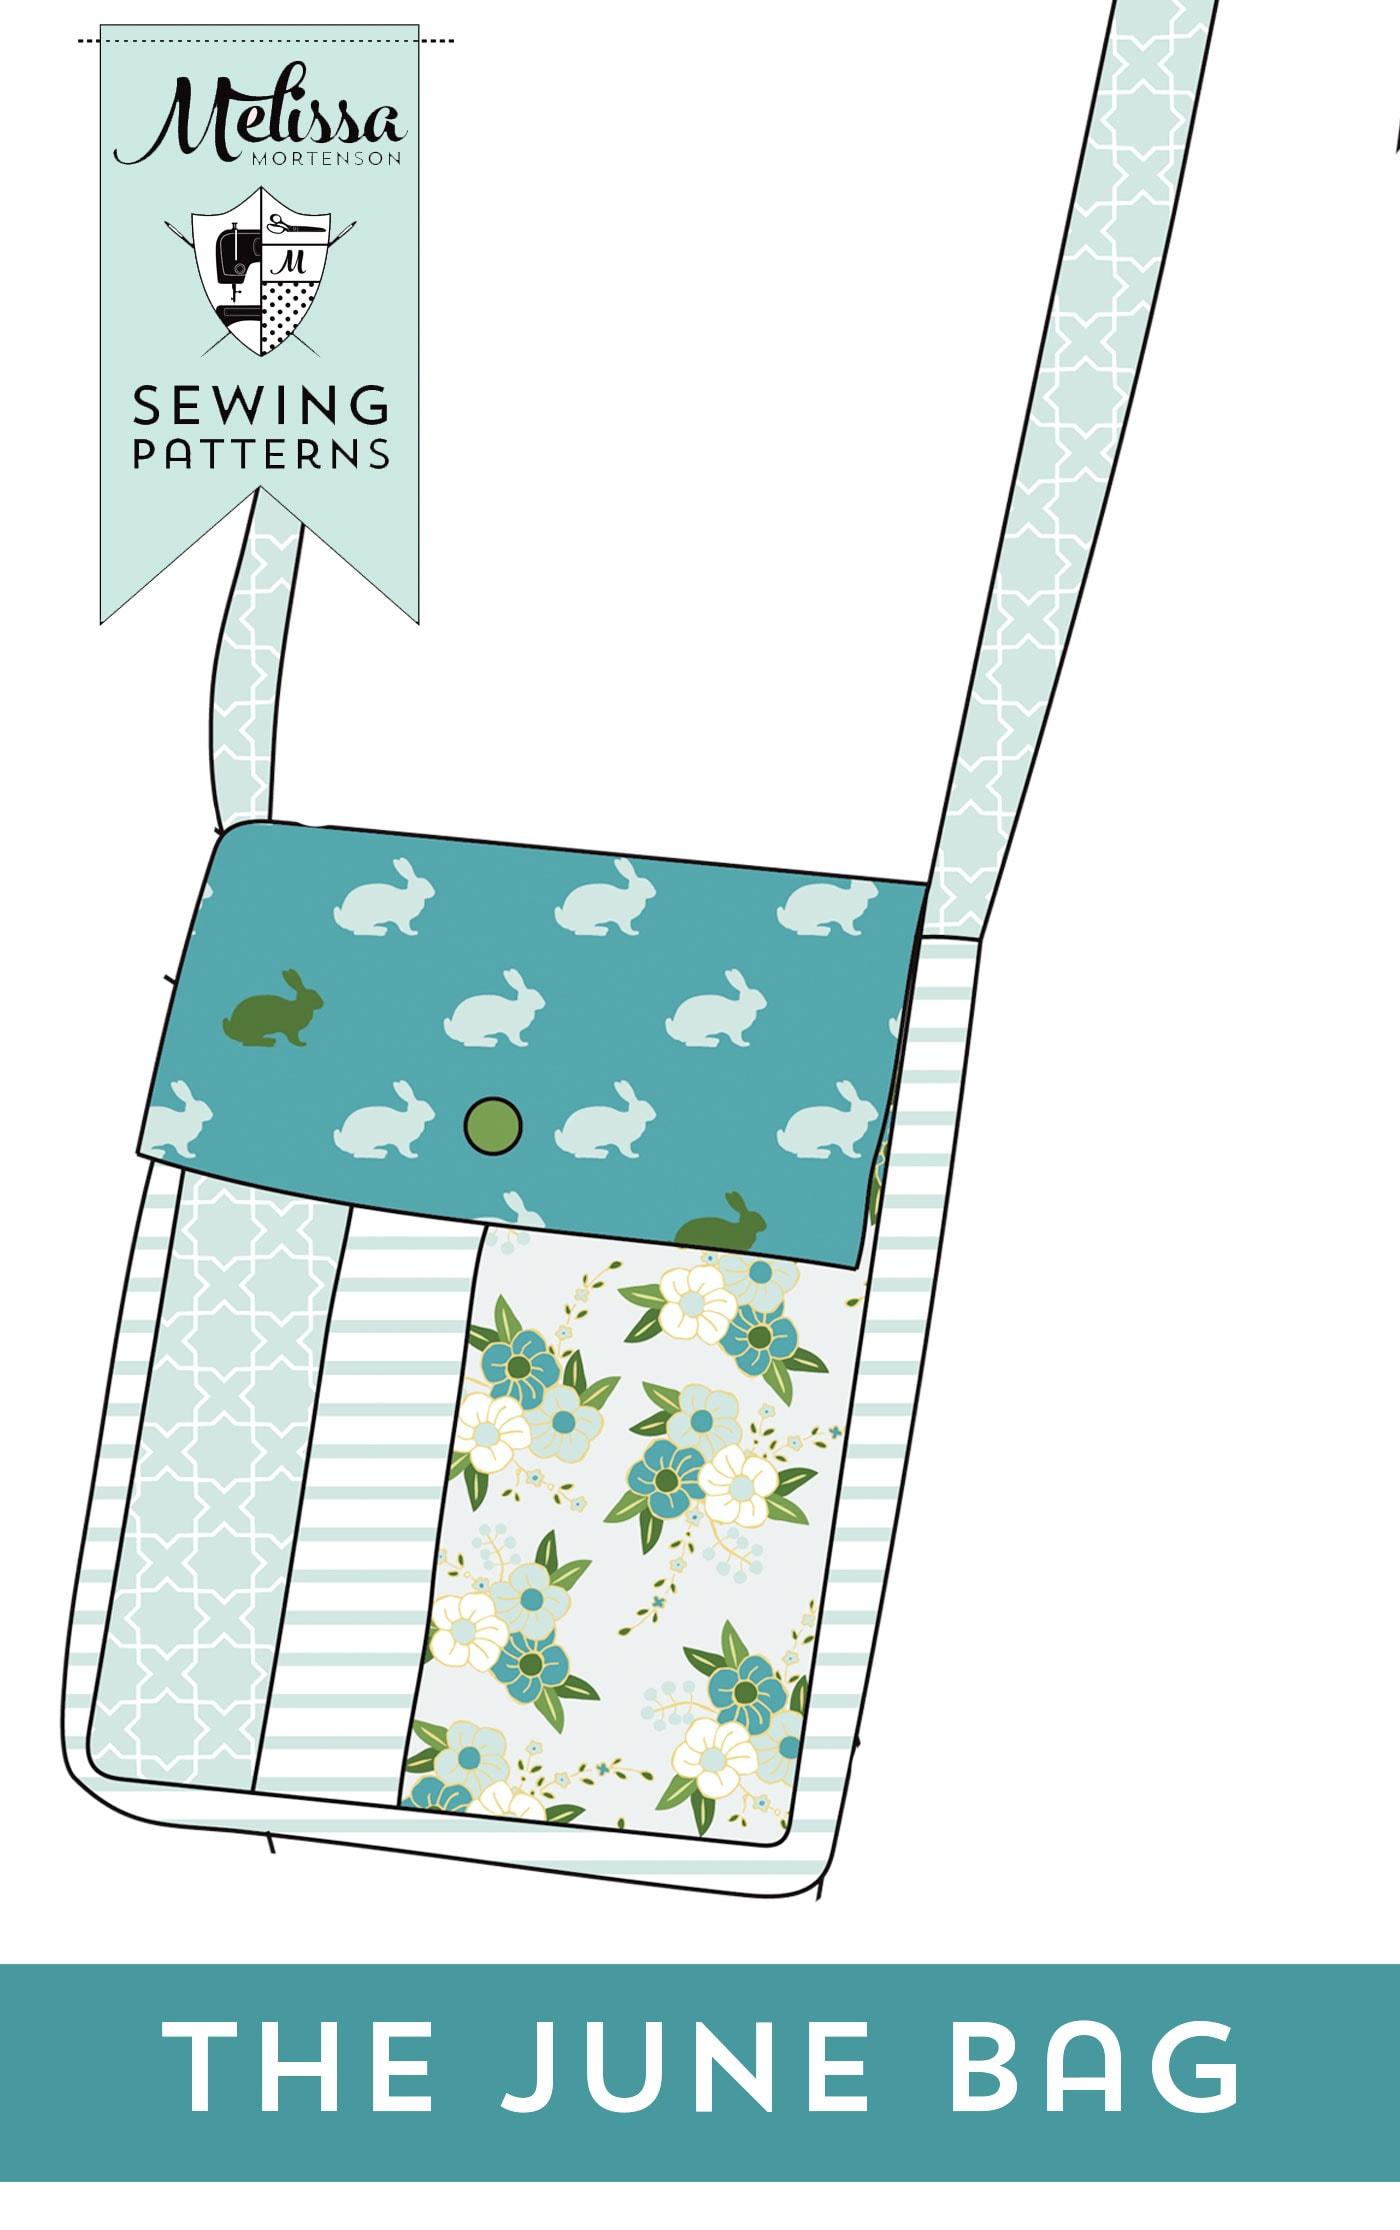 June Bag Small Cross Body Bag Sewing pattern by Melissa Mortenson of polkadotchair.com